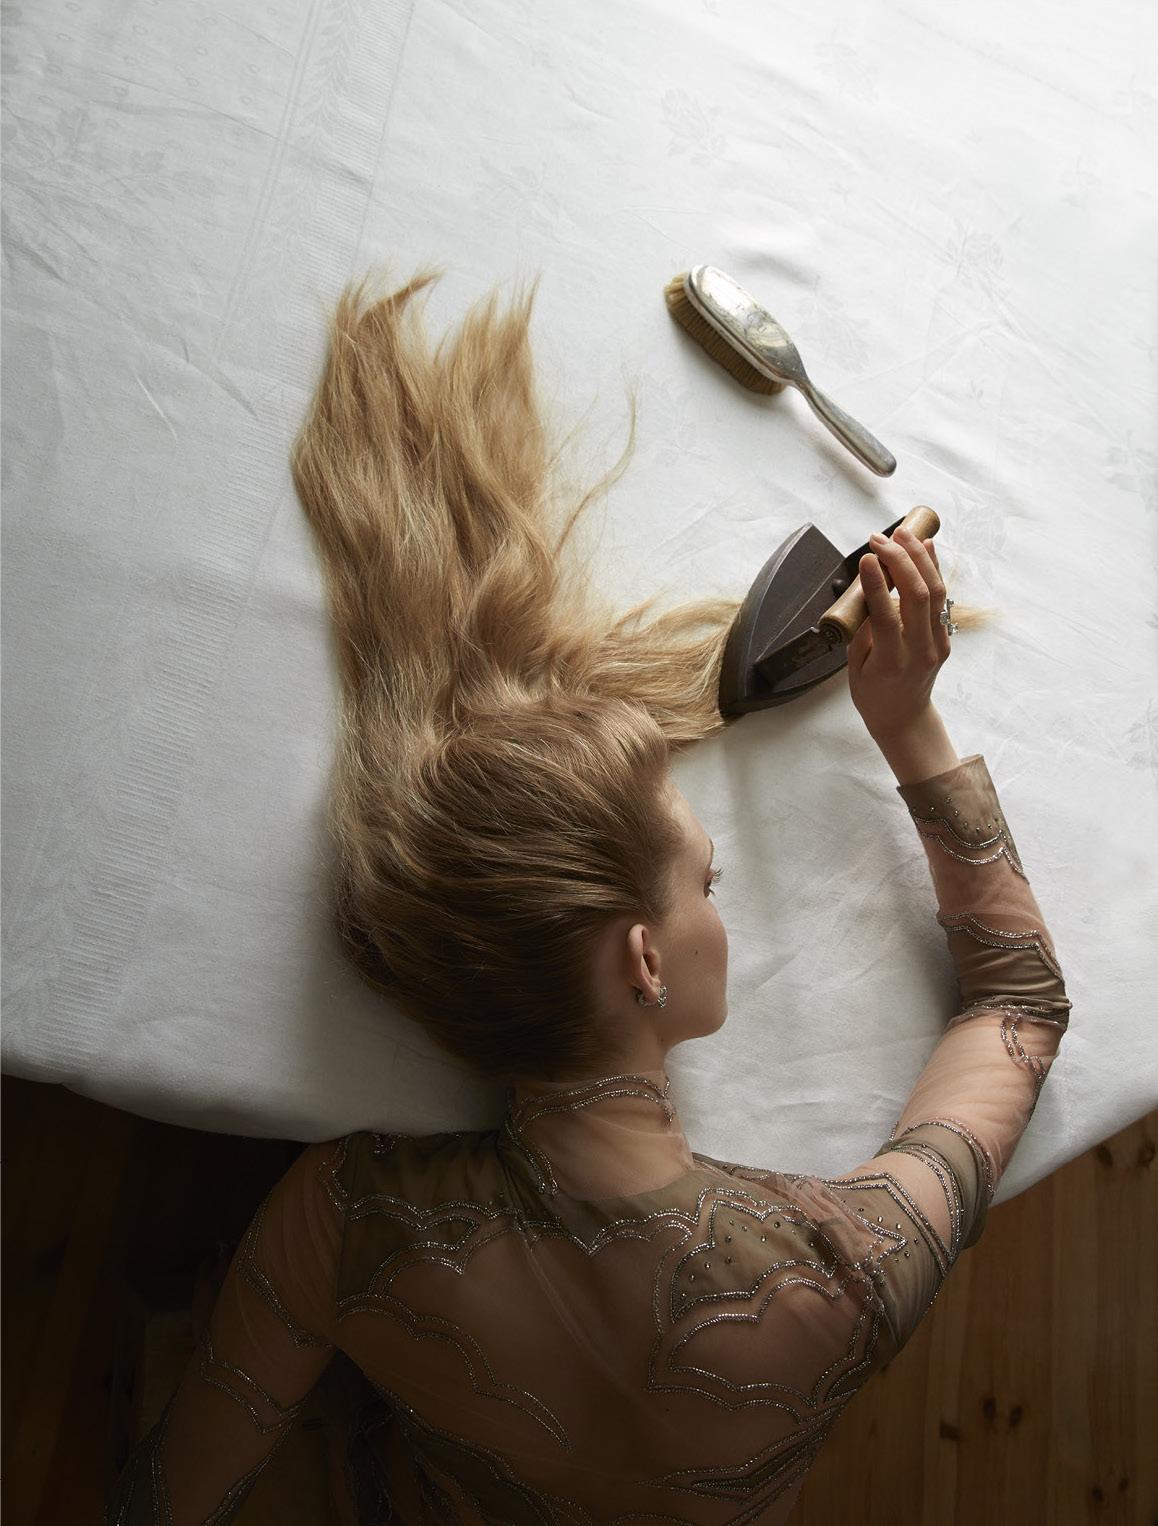 Сделай сам / Ella Wennstrom by Camilla Akrans for Vogue Italia November 2016